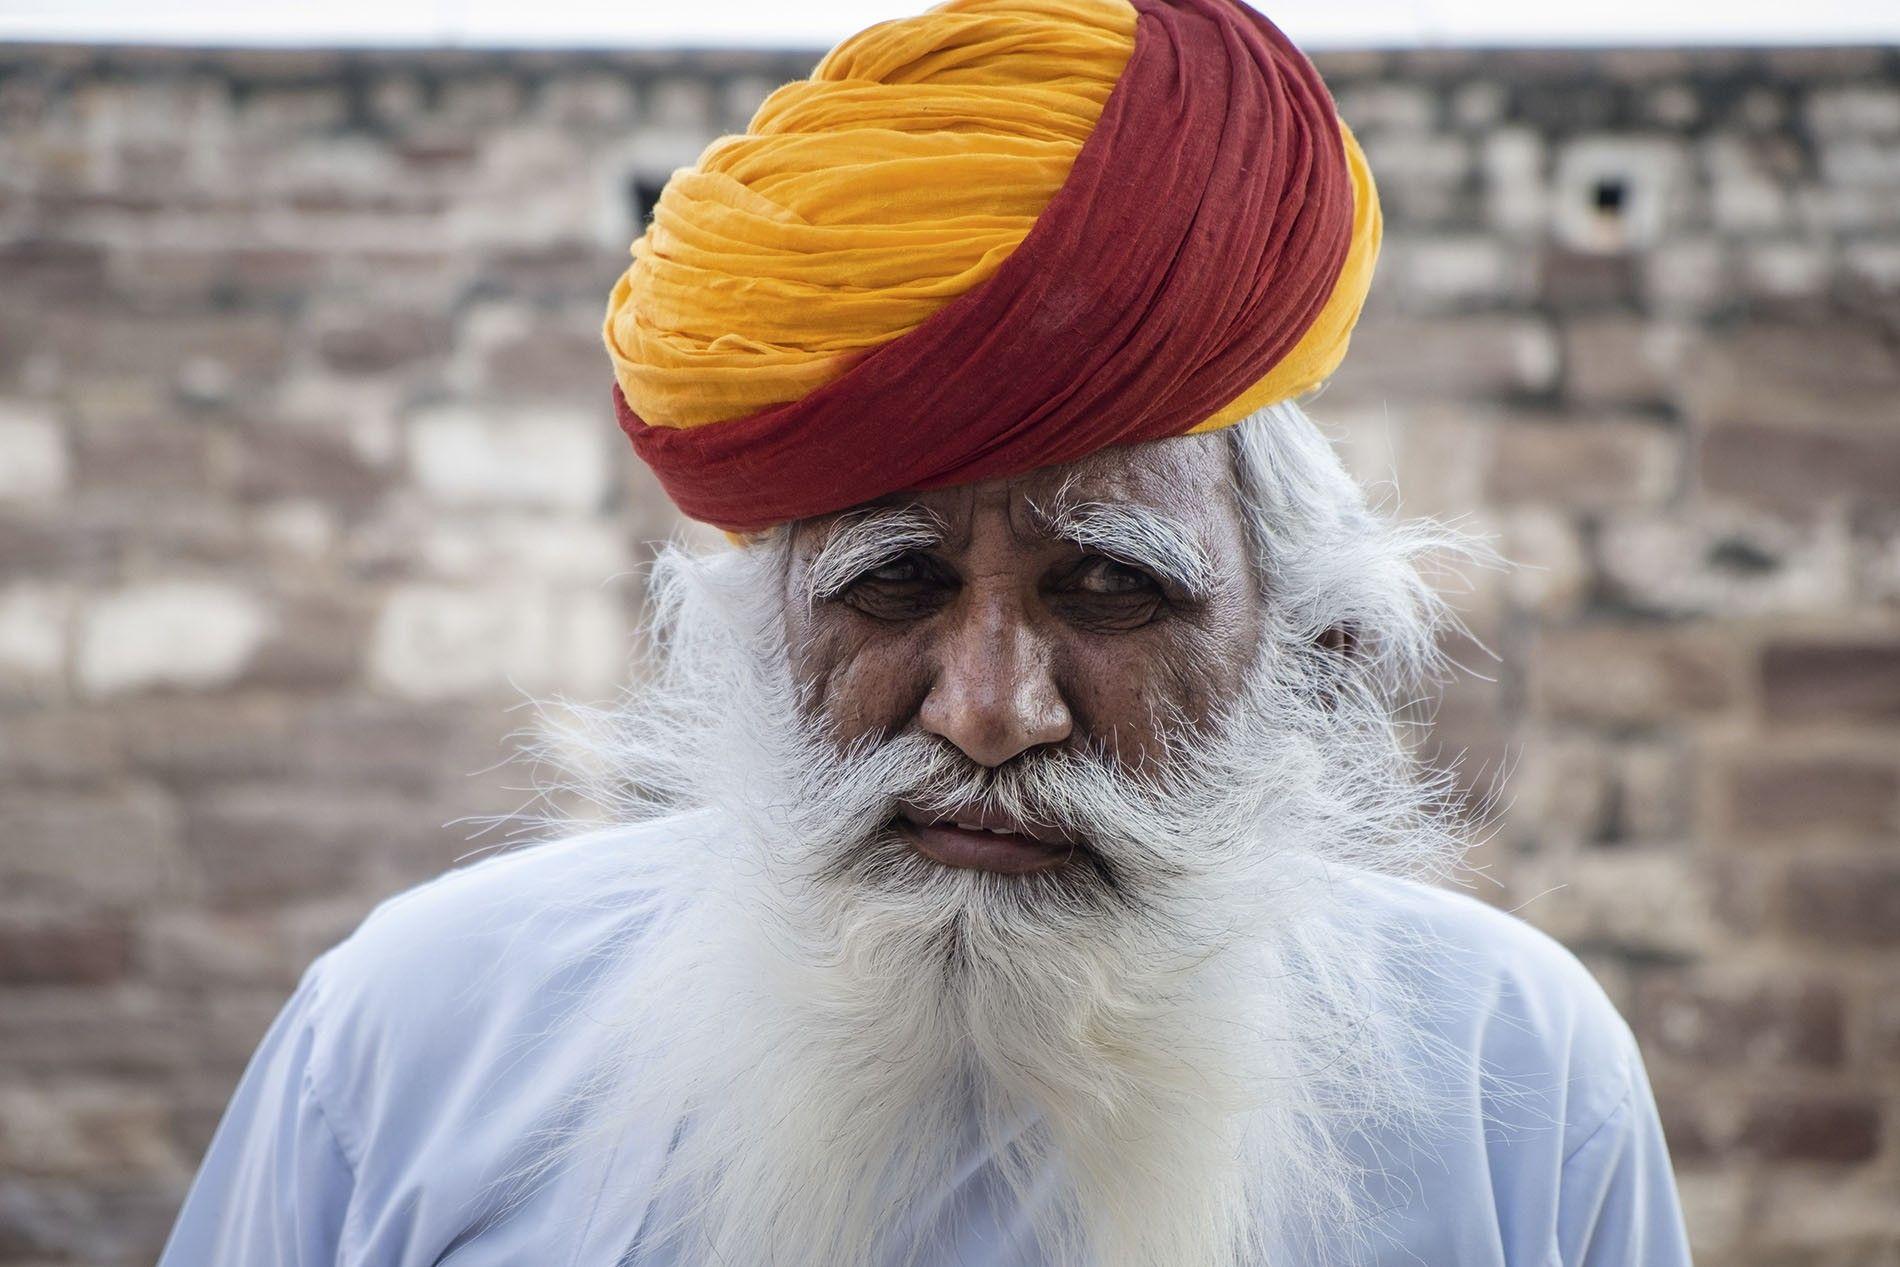 A caretaker of Mehrangarh Fort